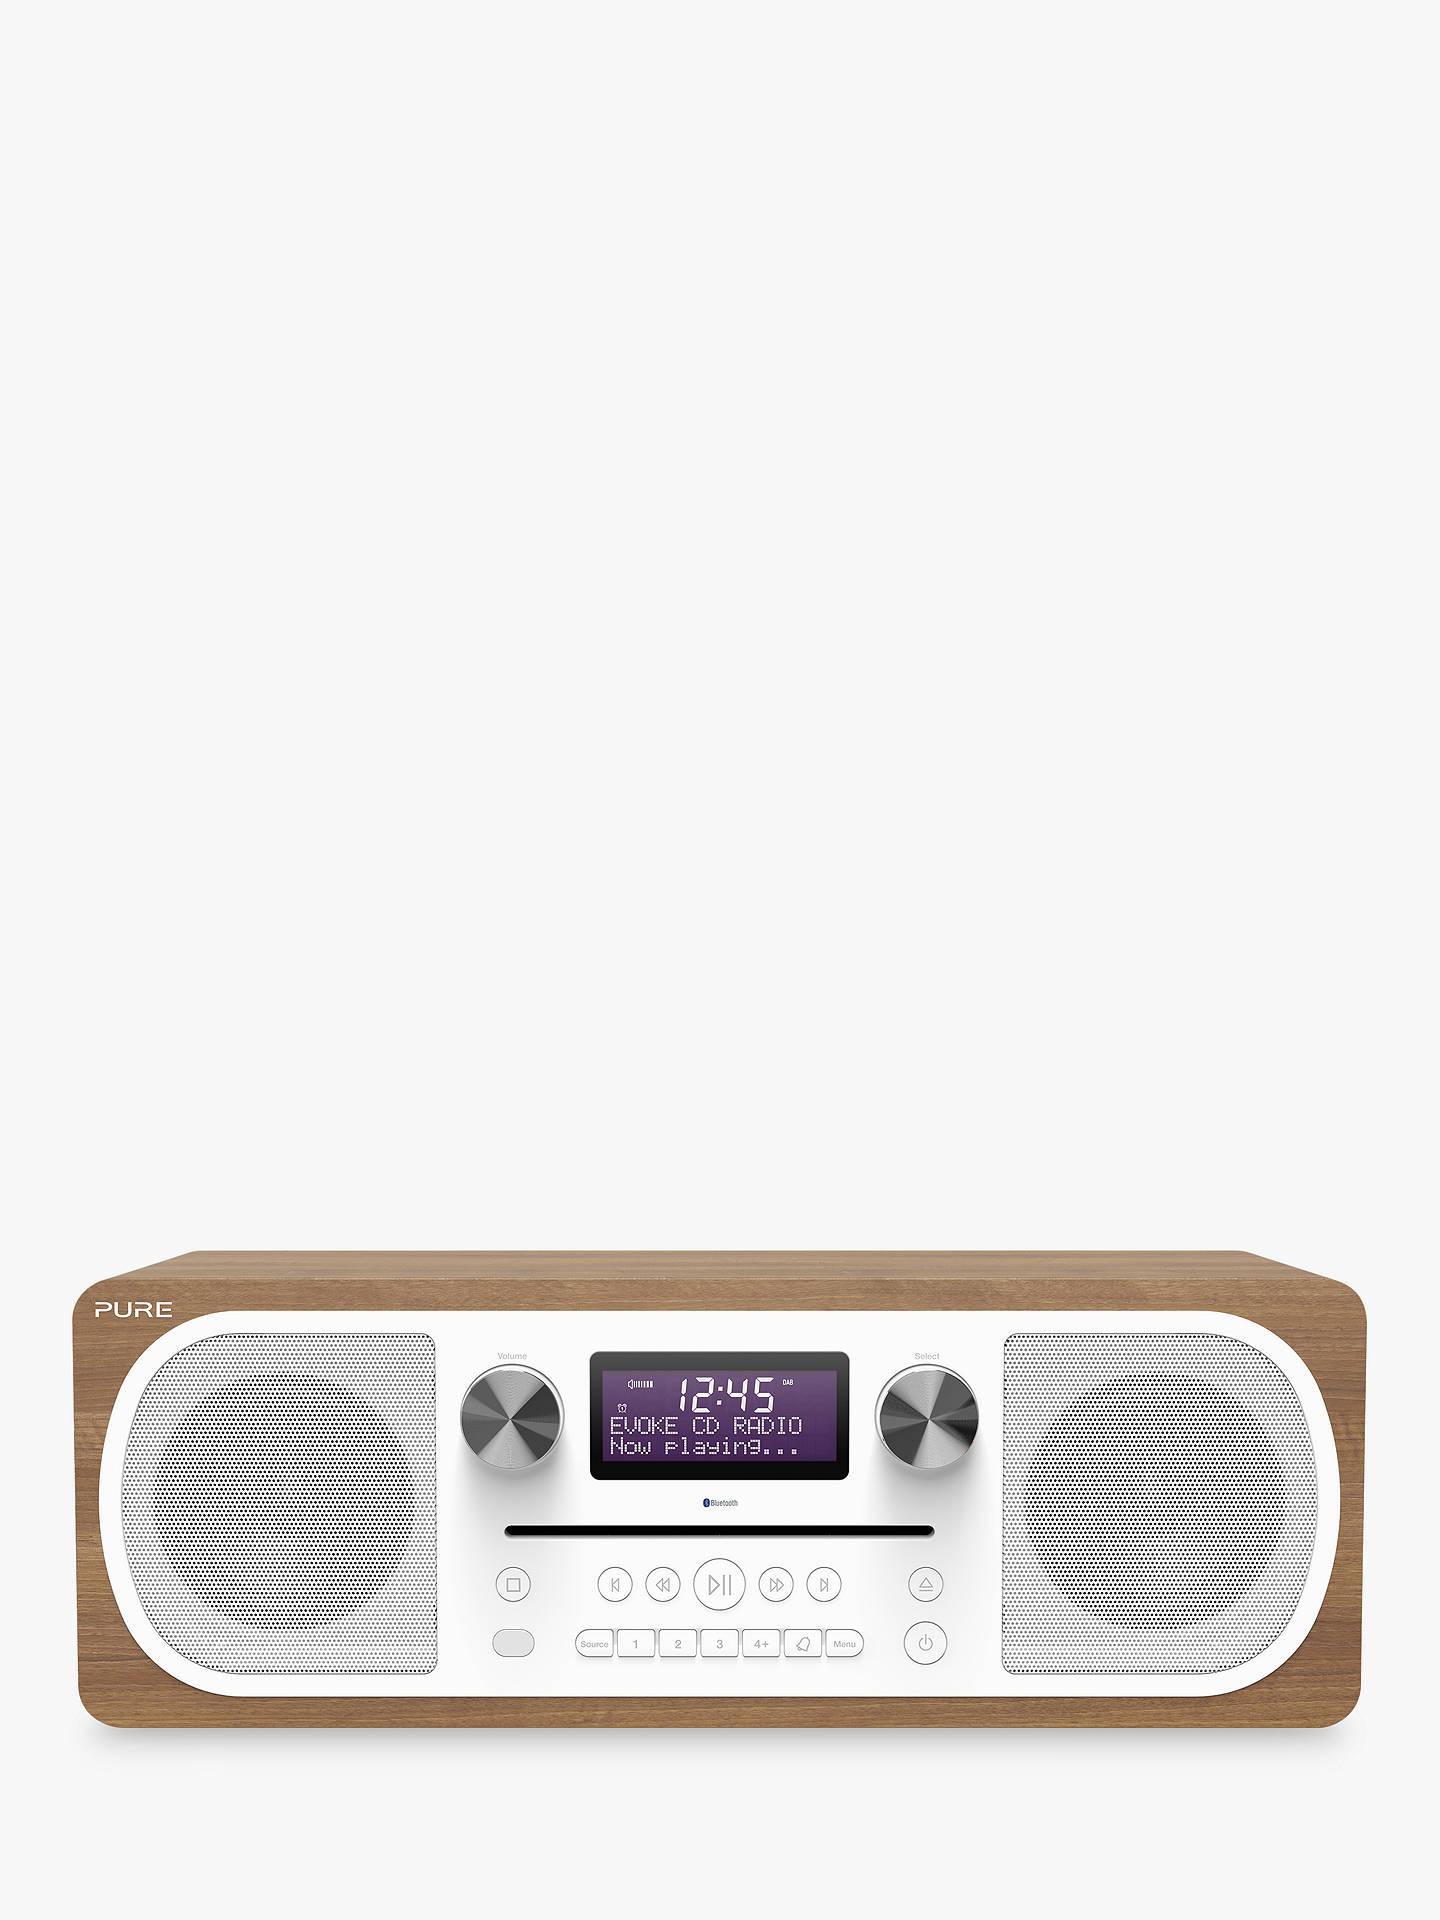 Pure Evoke C D6 DAB FM Bluetooth Stereo All In e Music System